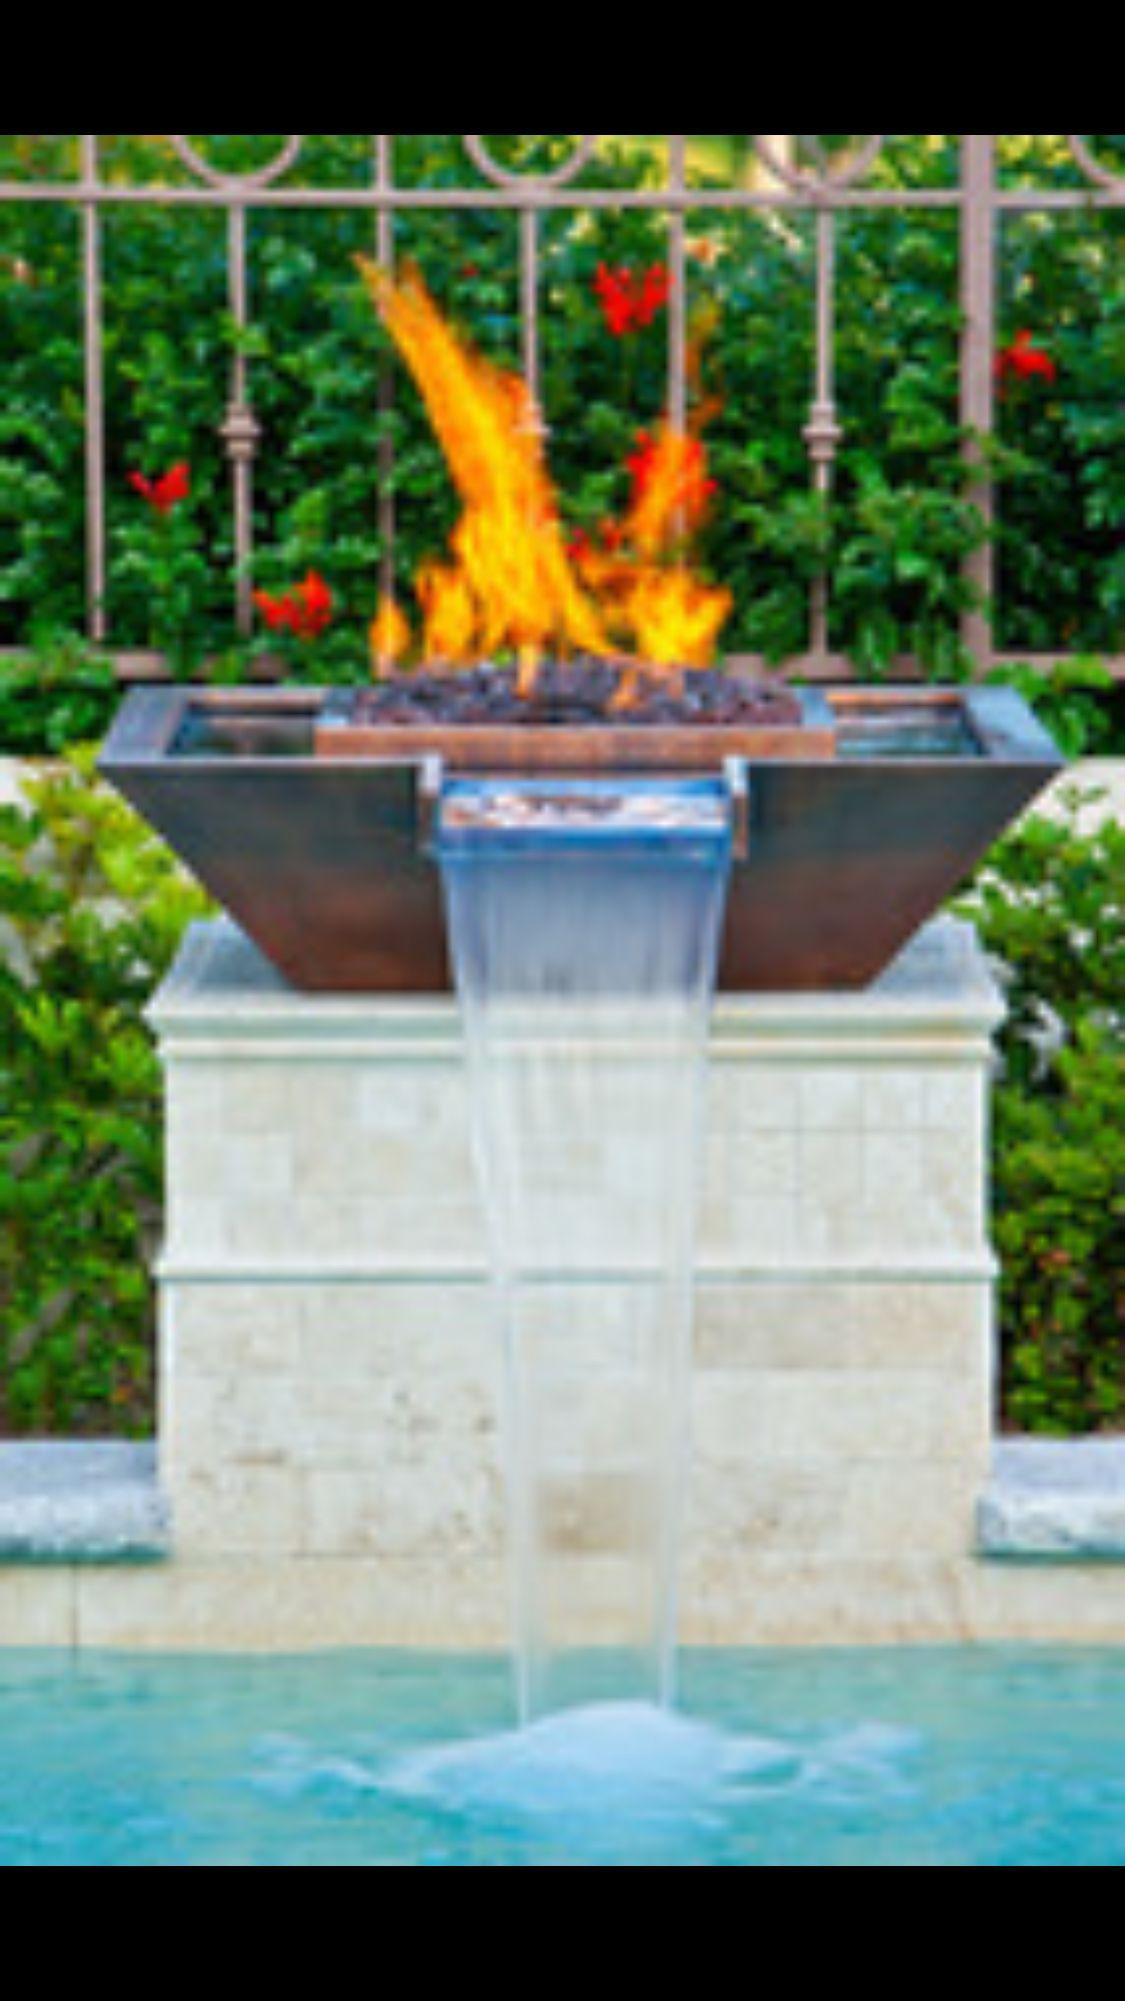 Pin By Jennifer Mattingly On Pool Area Fire Feature Fire Pots